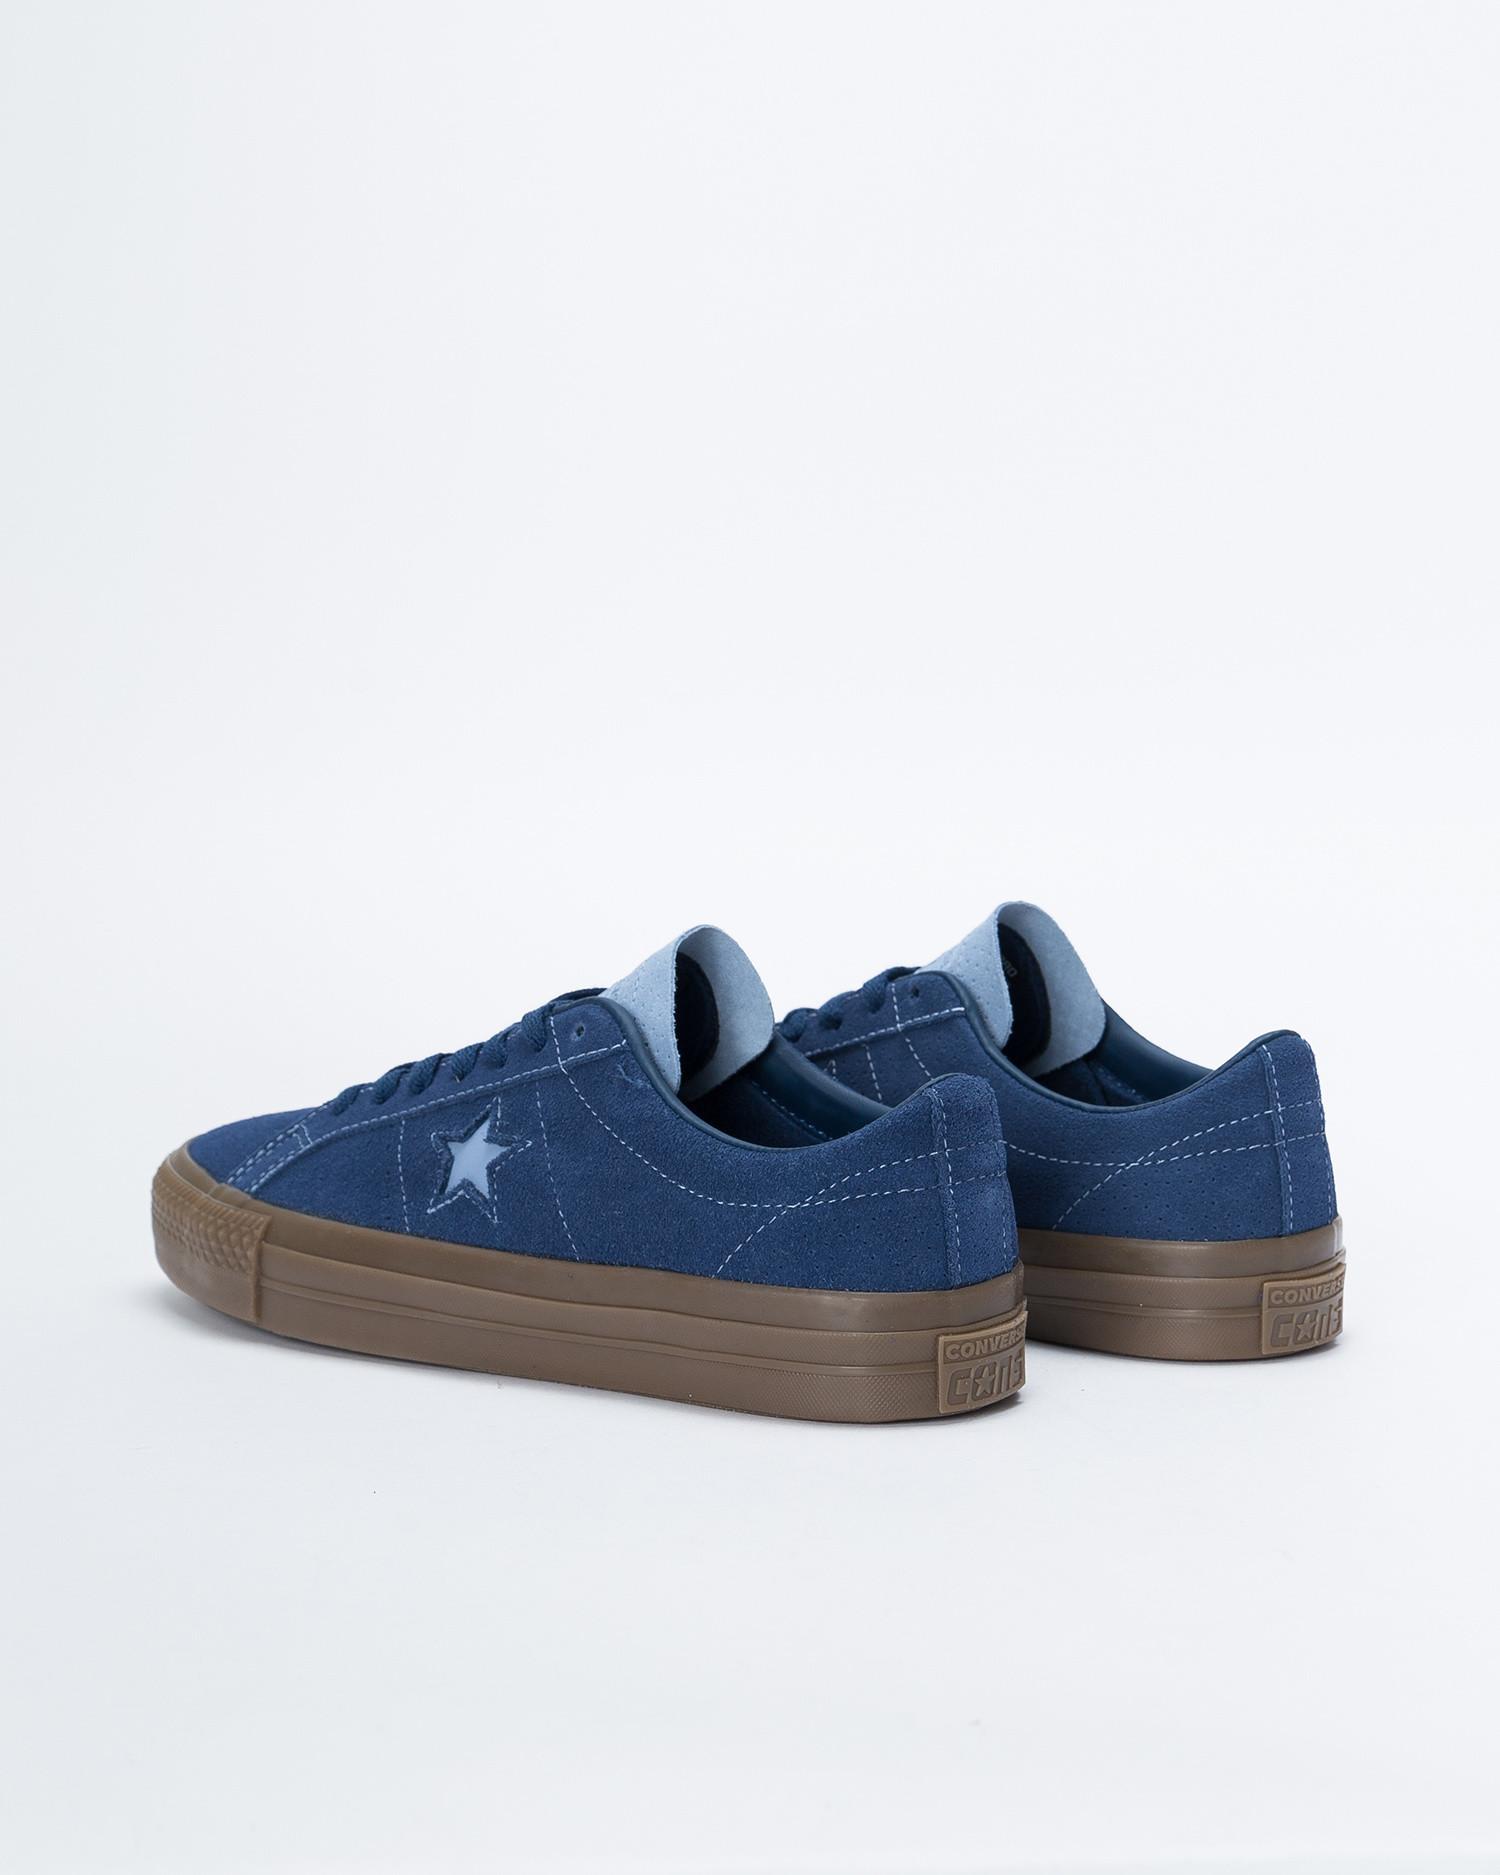 Converse One Star Pro Ox Navy/Indigo Fog/Brown